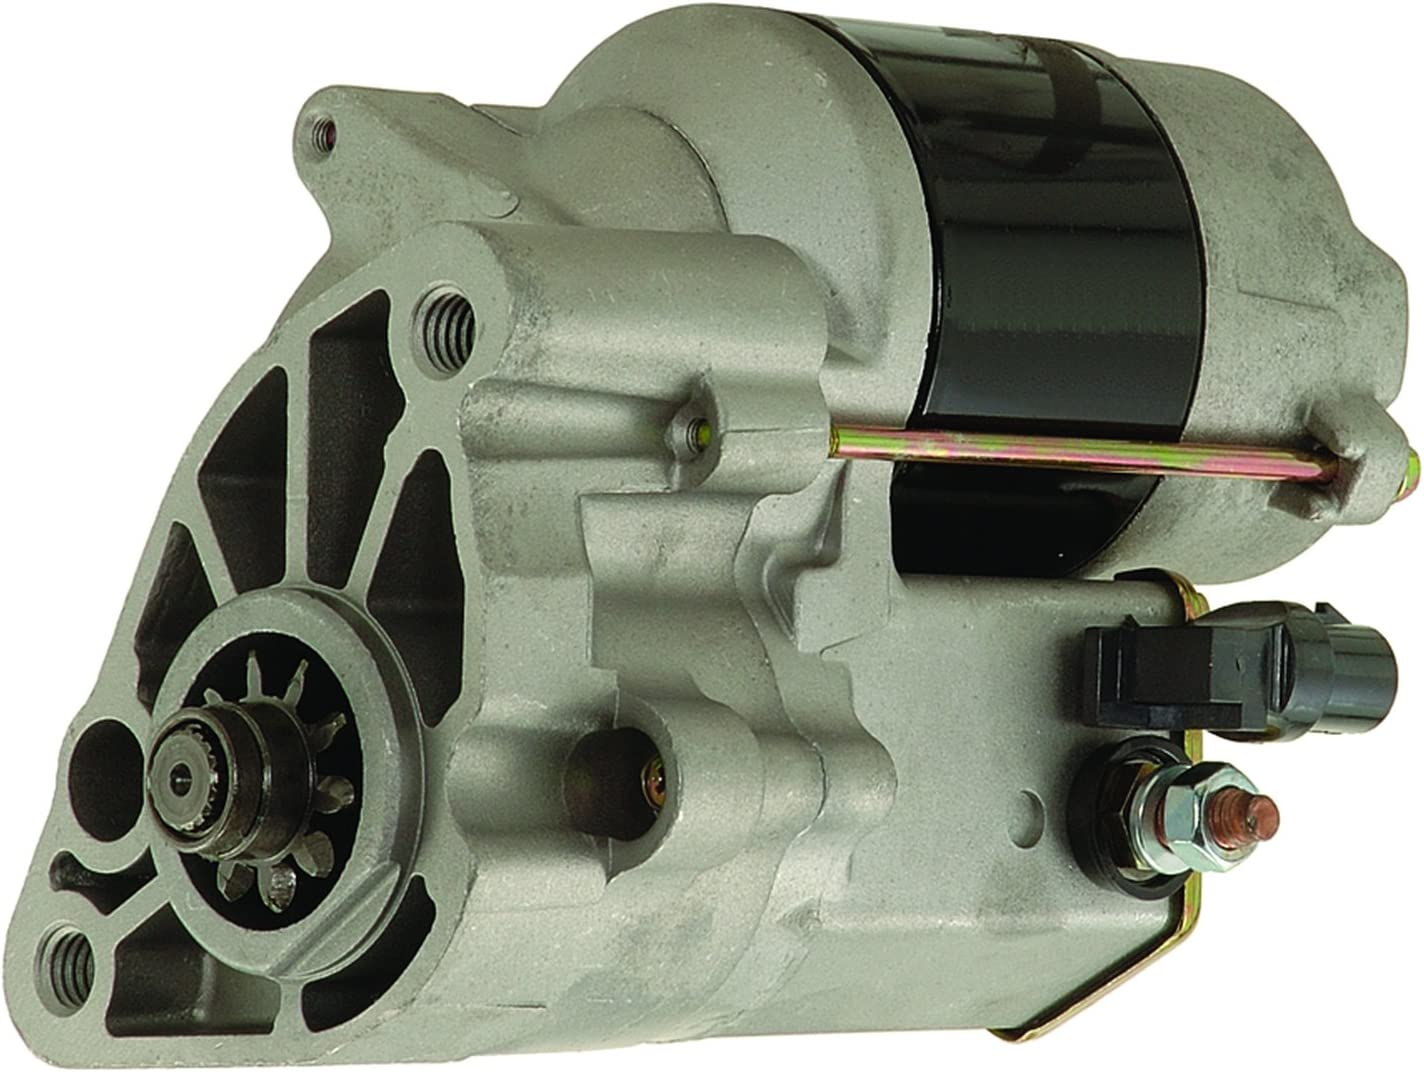 B00S0DBUEE ACDelco 337-1160 Professional Starter 71FgsG579DL.SL1500_